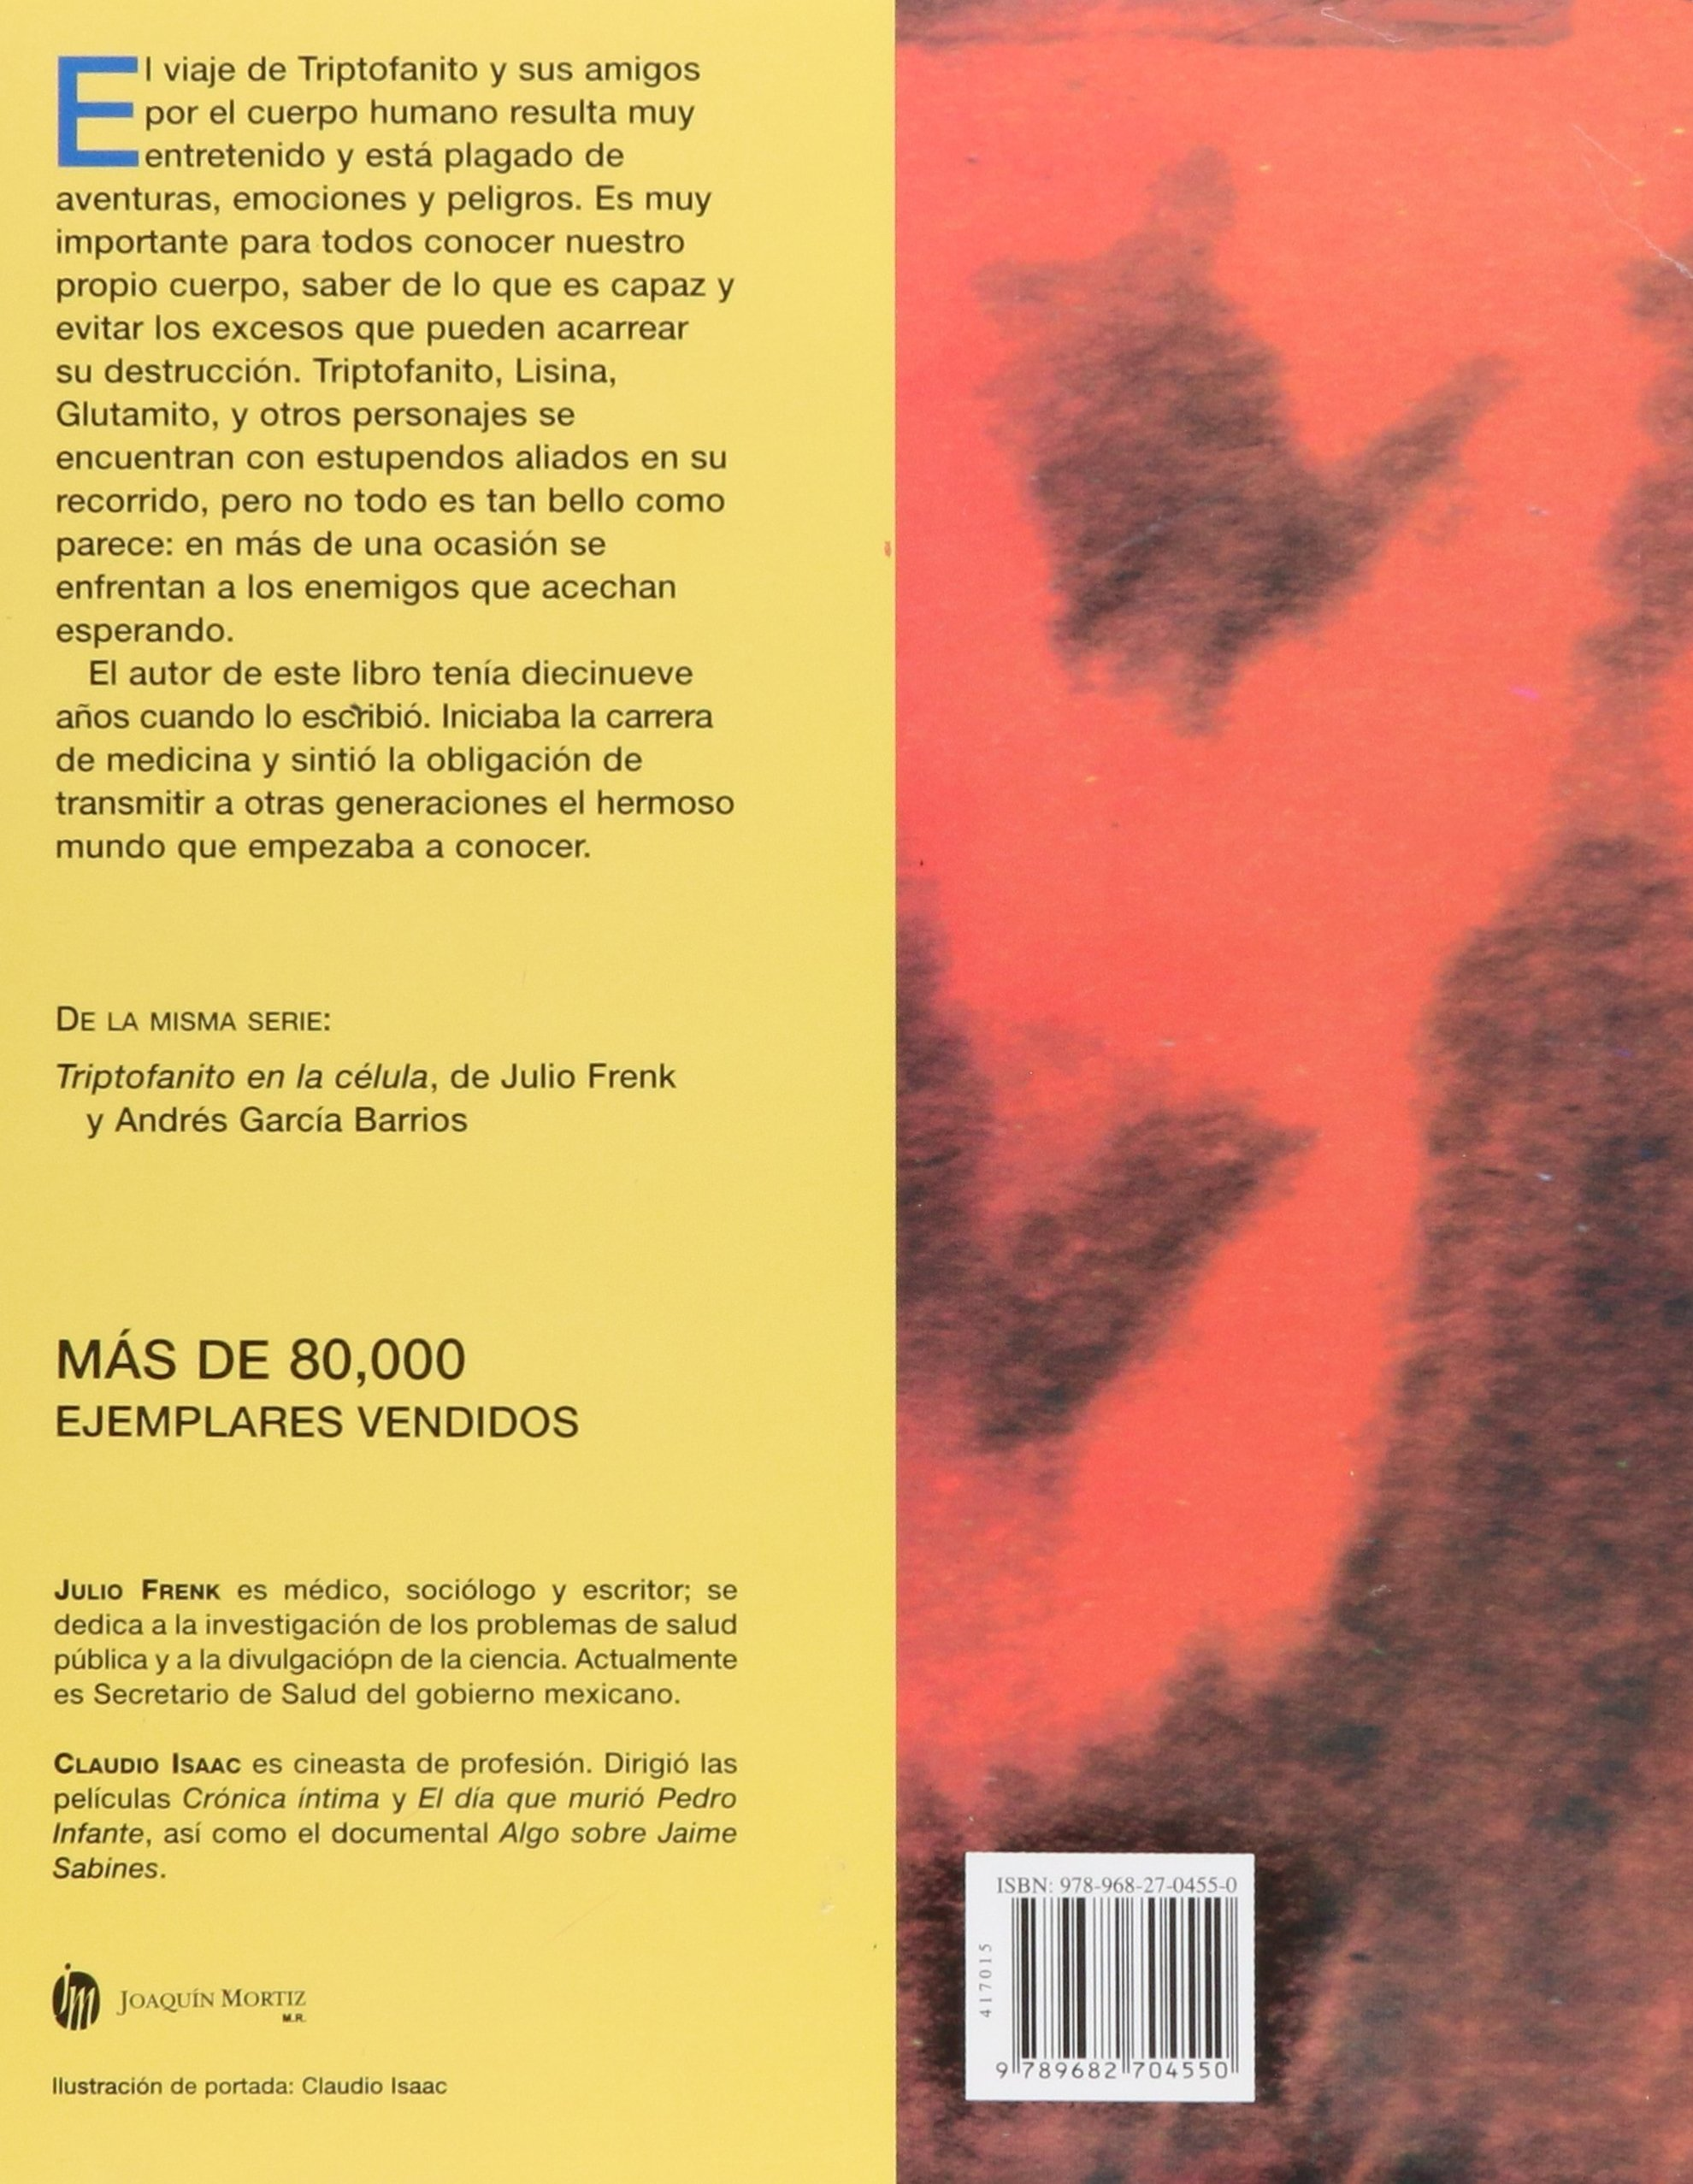 Amazon.com: Triptofanito (Infaltil y Juvenil) (Spanish Edition) (9789682704550): Julio Frenk: Books